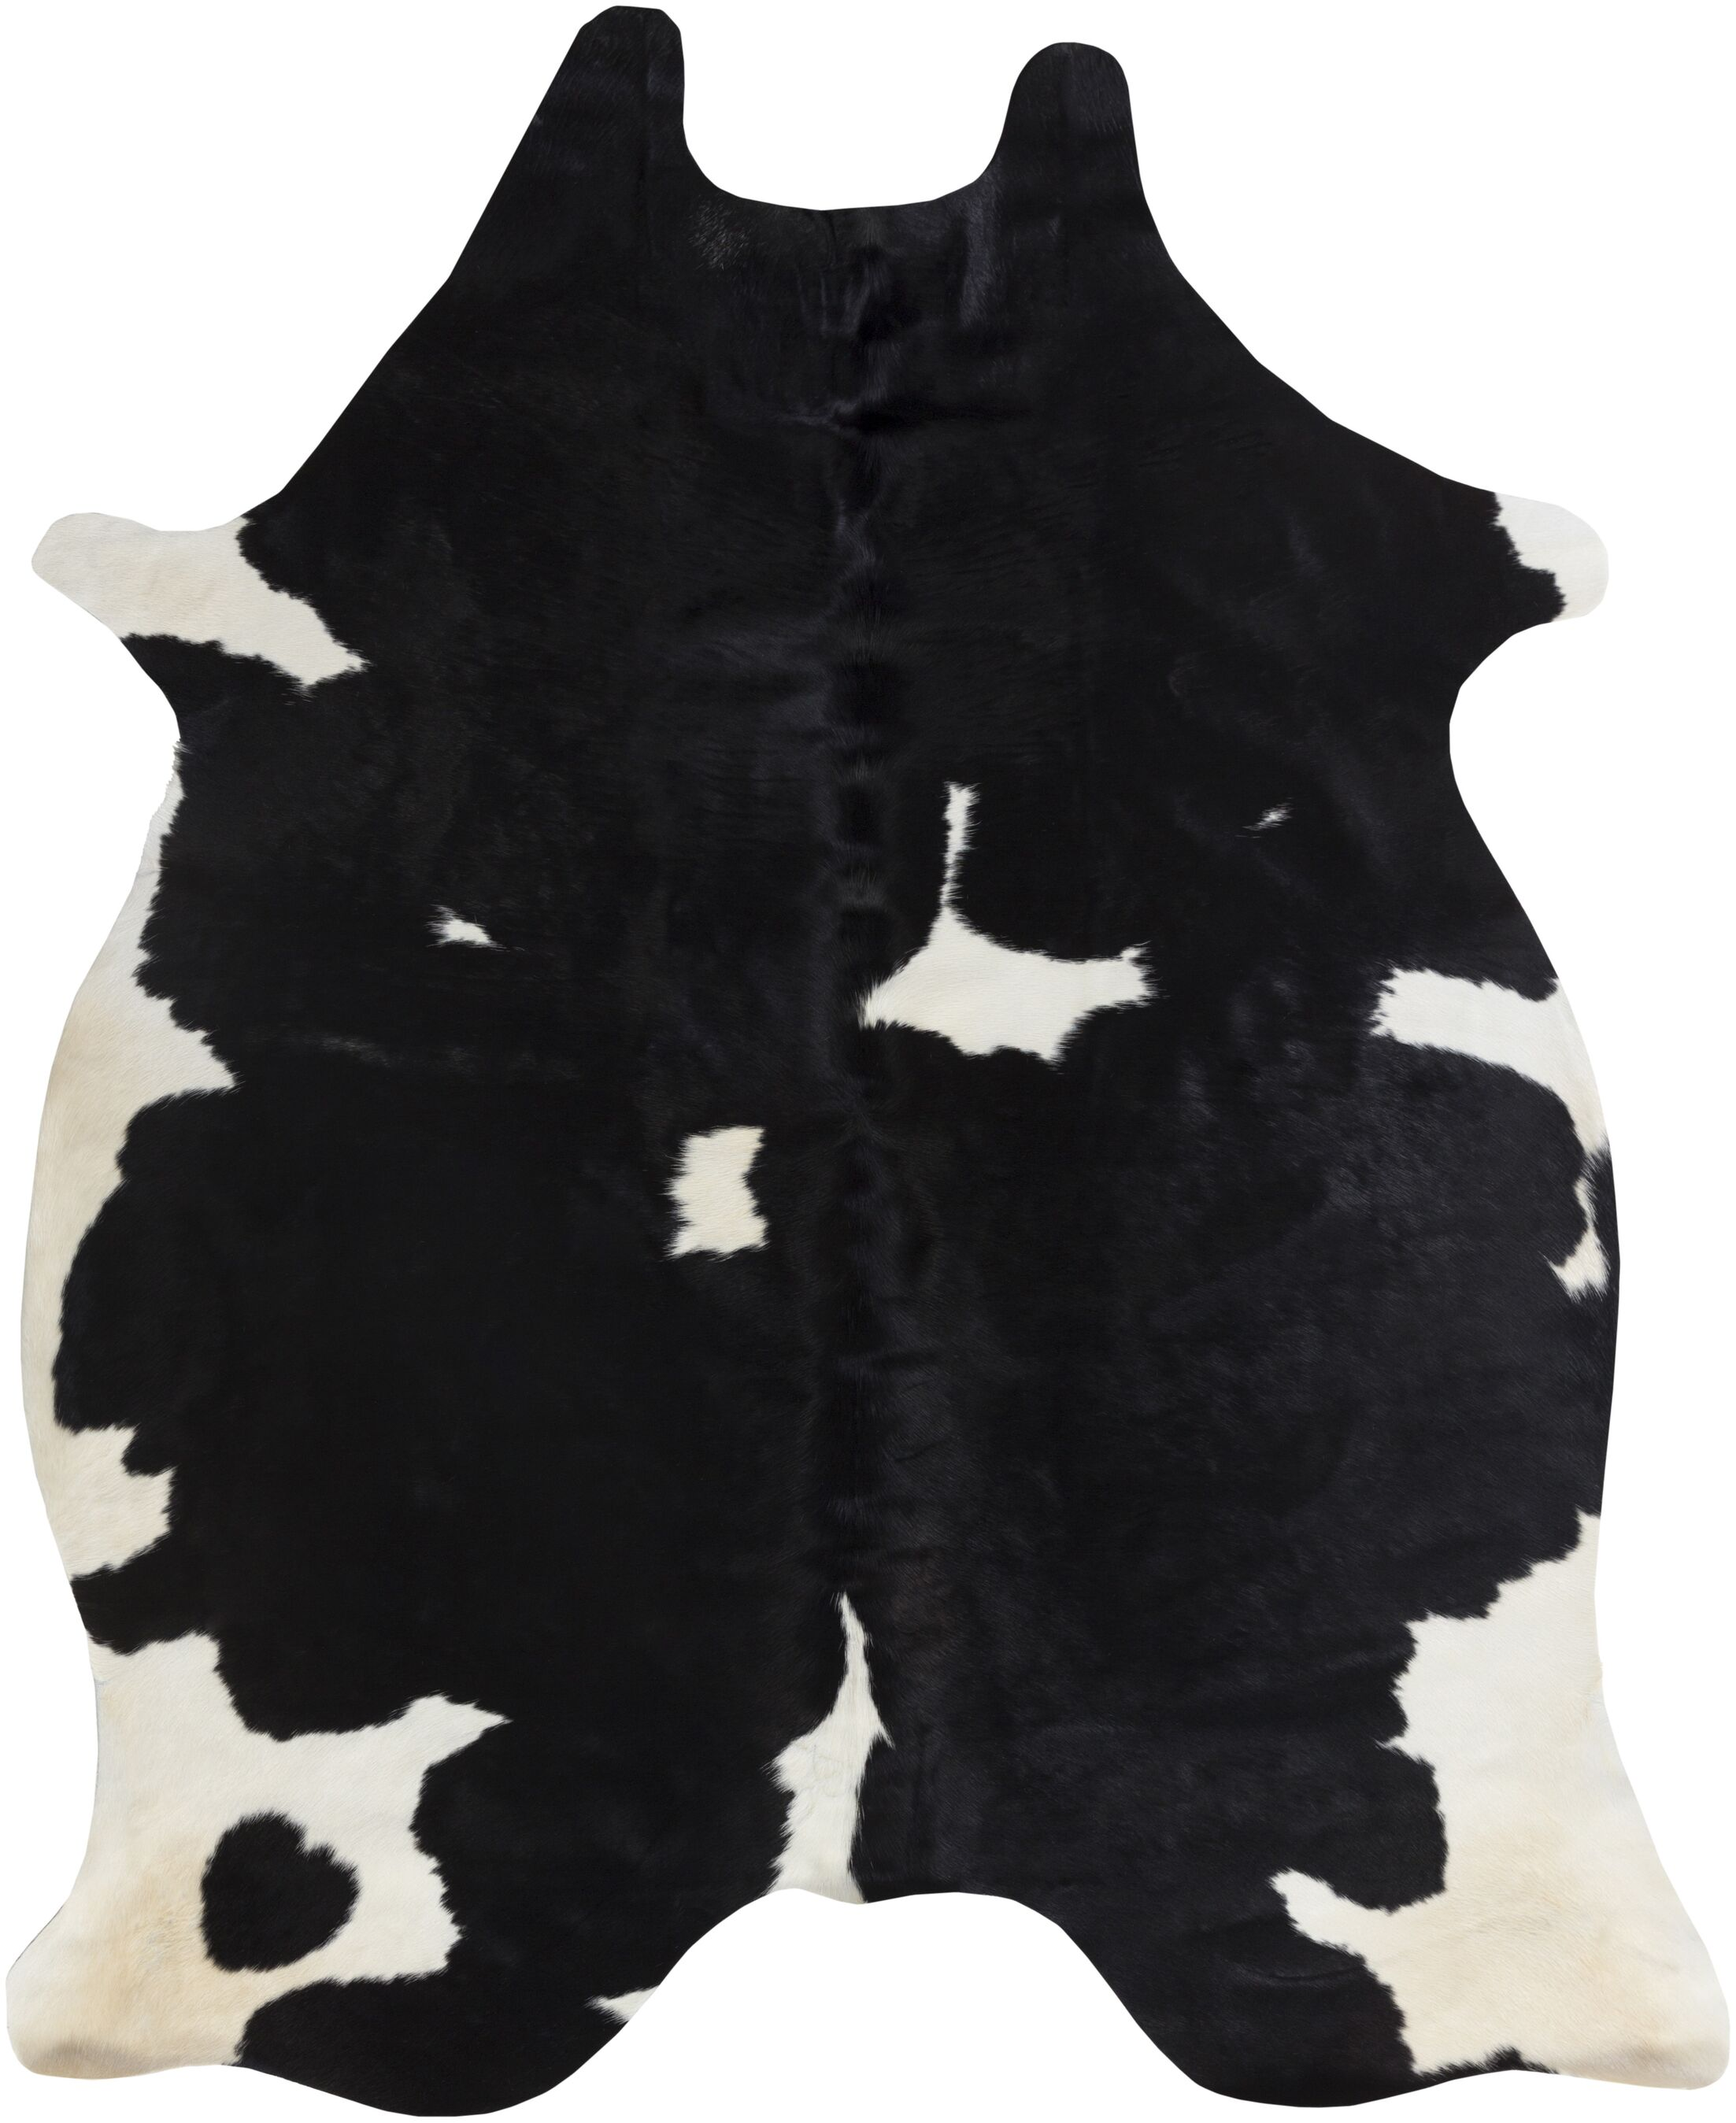 Pires Hand-Tufted Black/White Area Rug